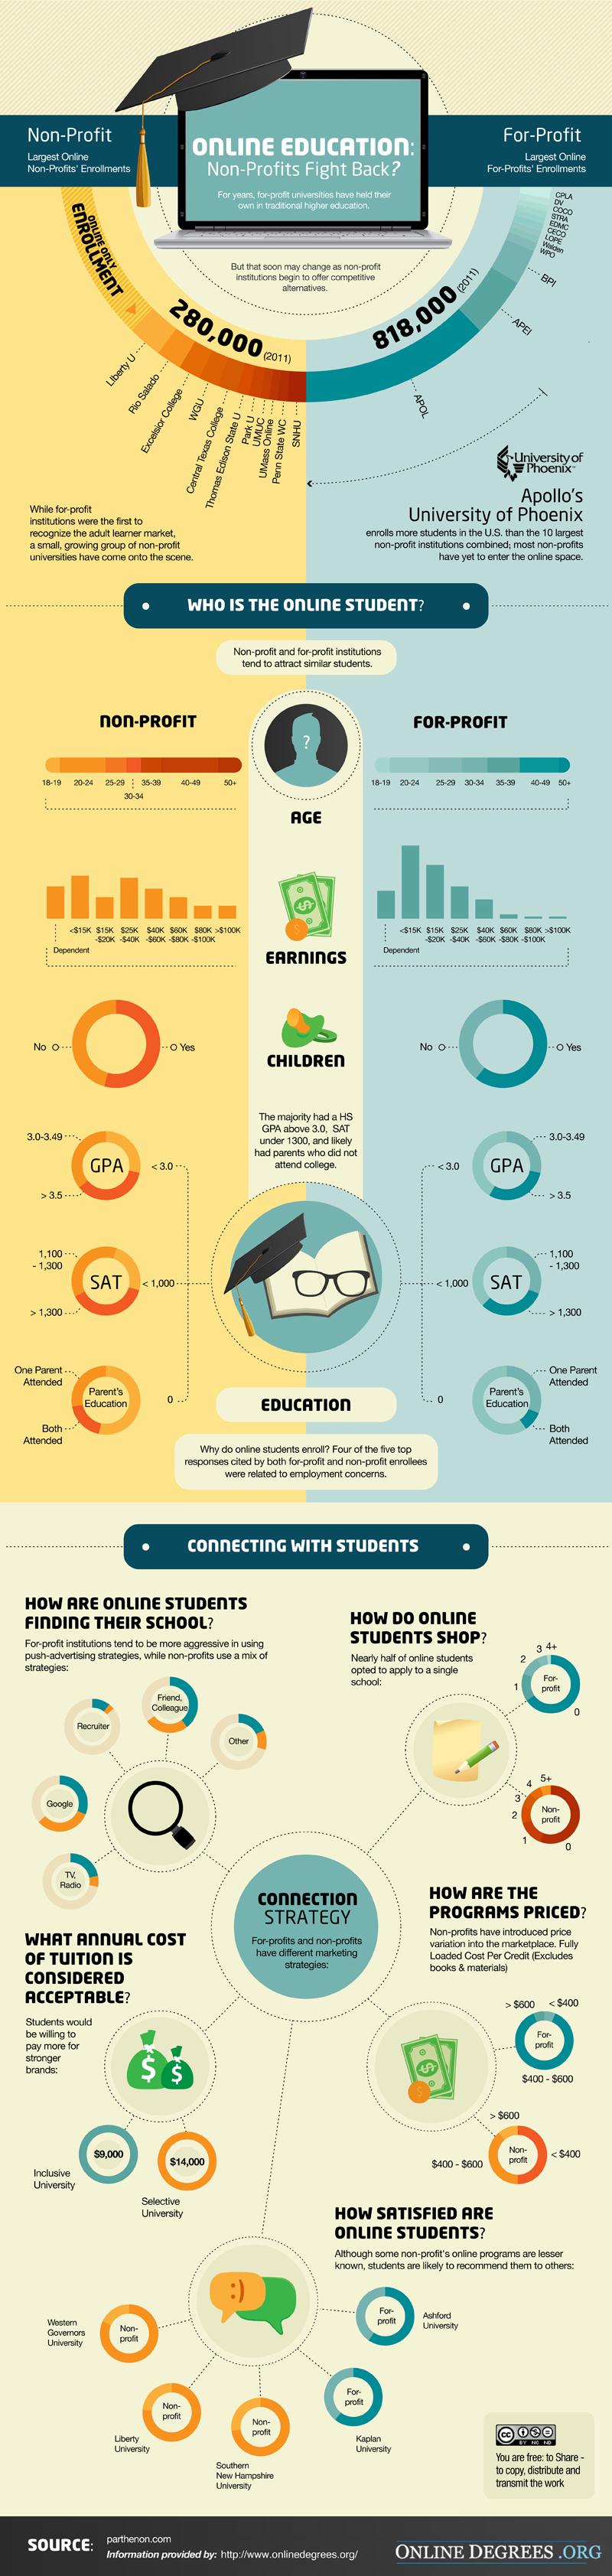 OnlineEducationNonProfitsFightBack